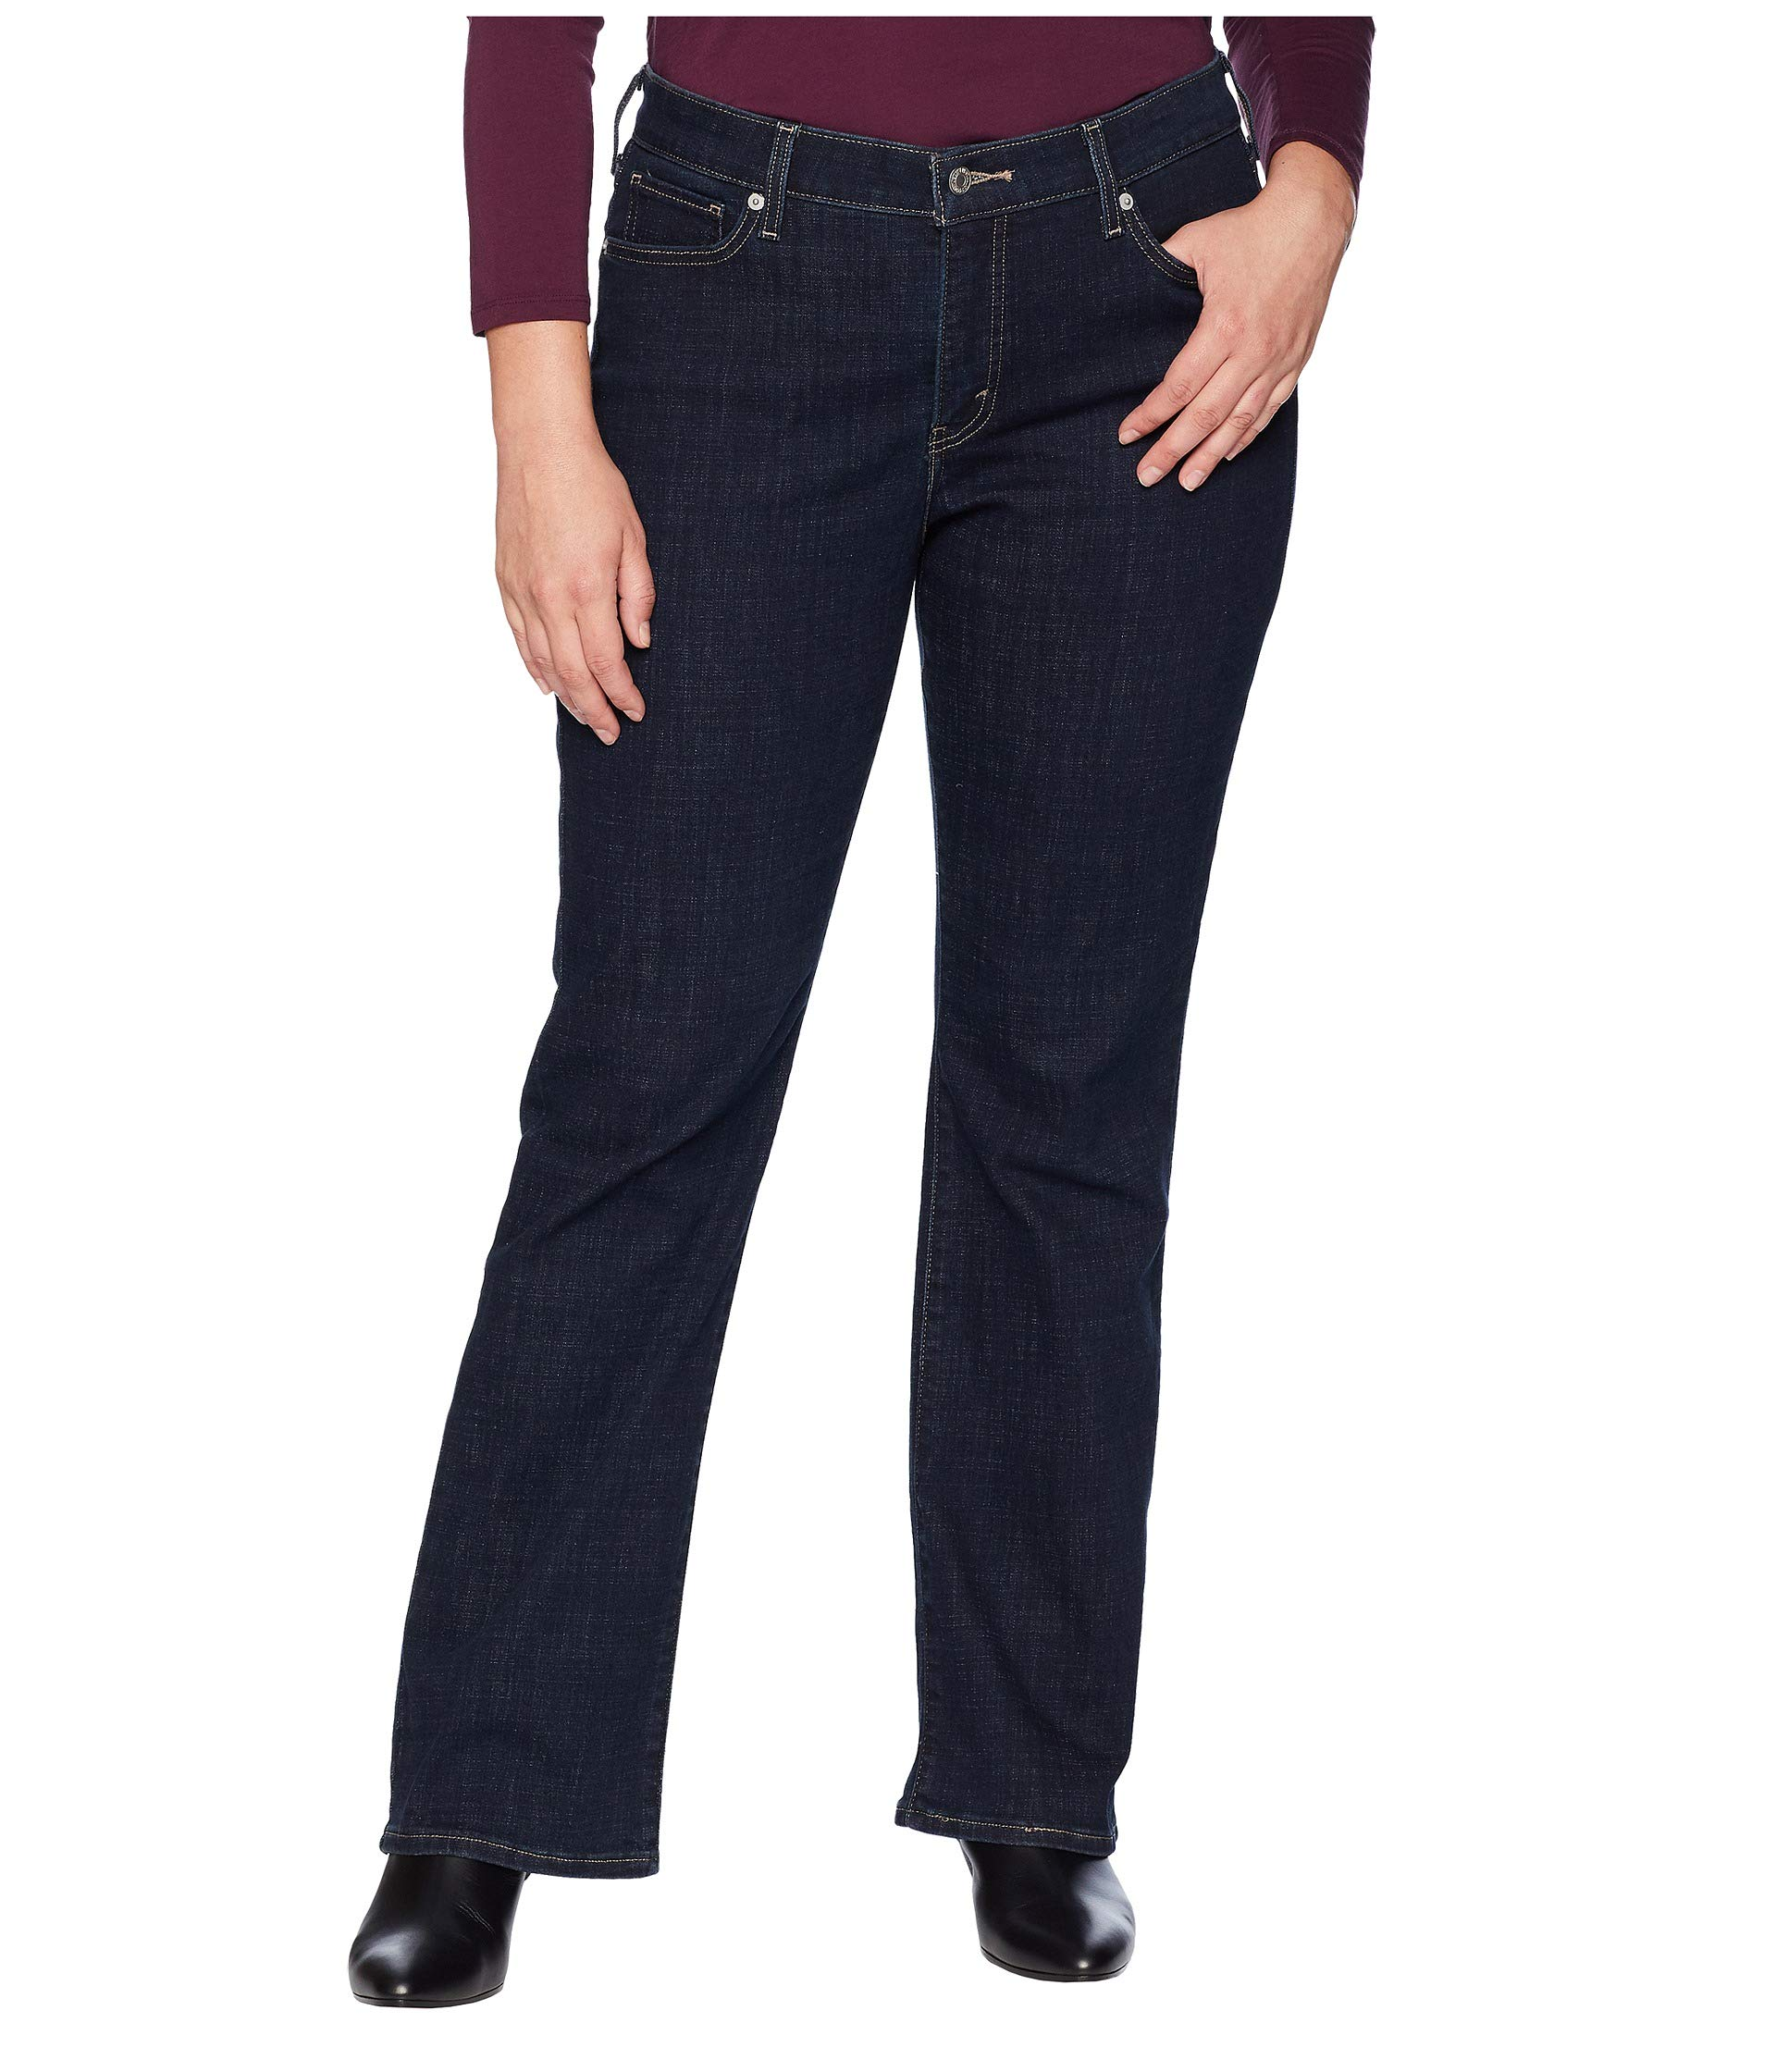 Levi's Women's Plus-Size 415 Classic Bootcut Jeans, Island Rinse, 38 (US 18) S